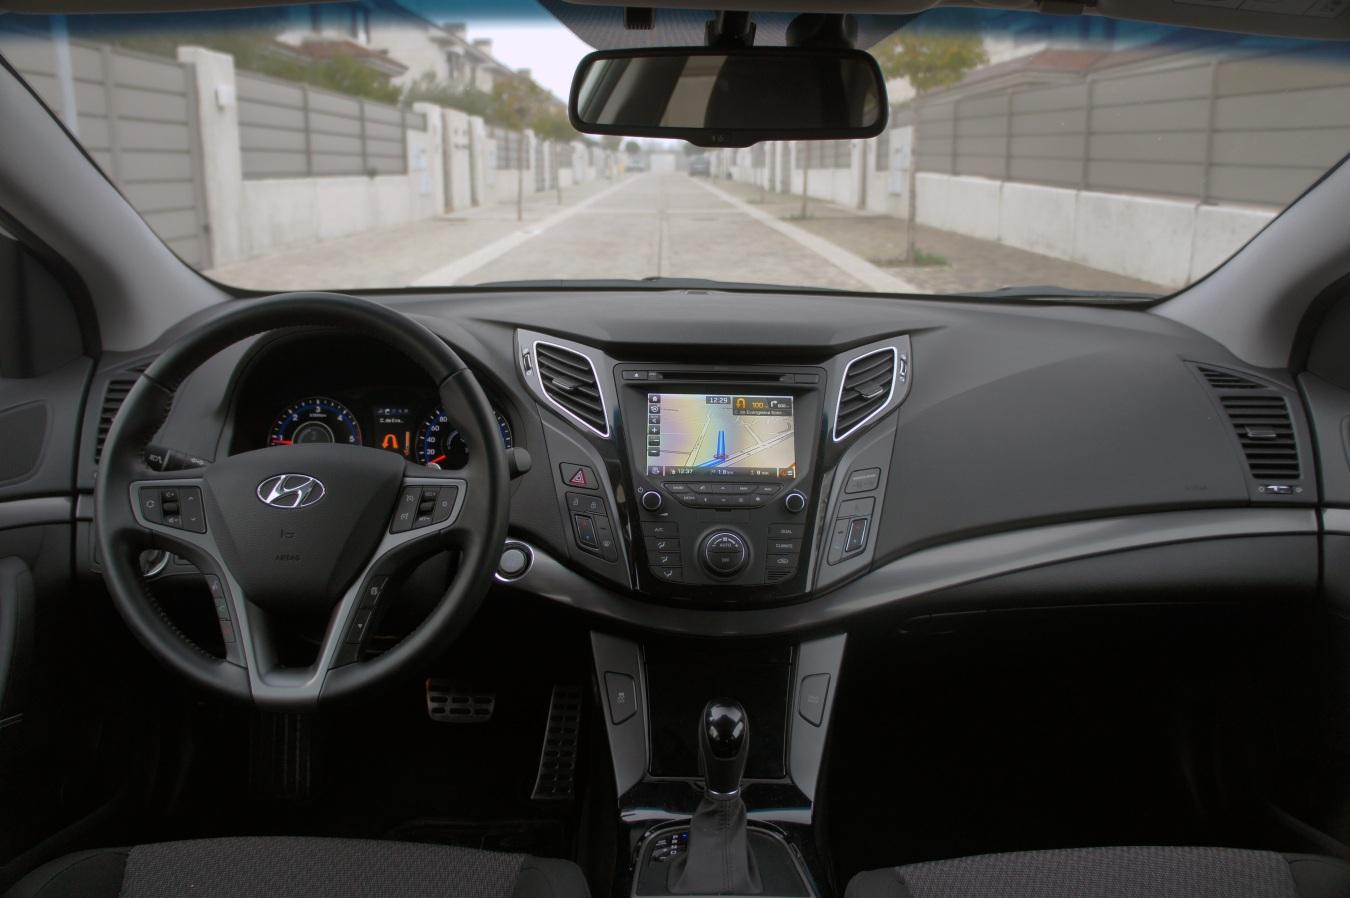 Prueba-Hyundai-i4044